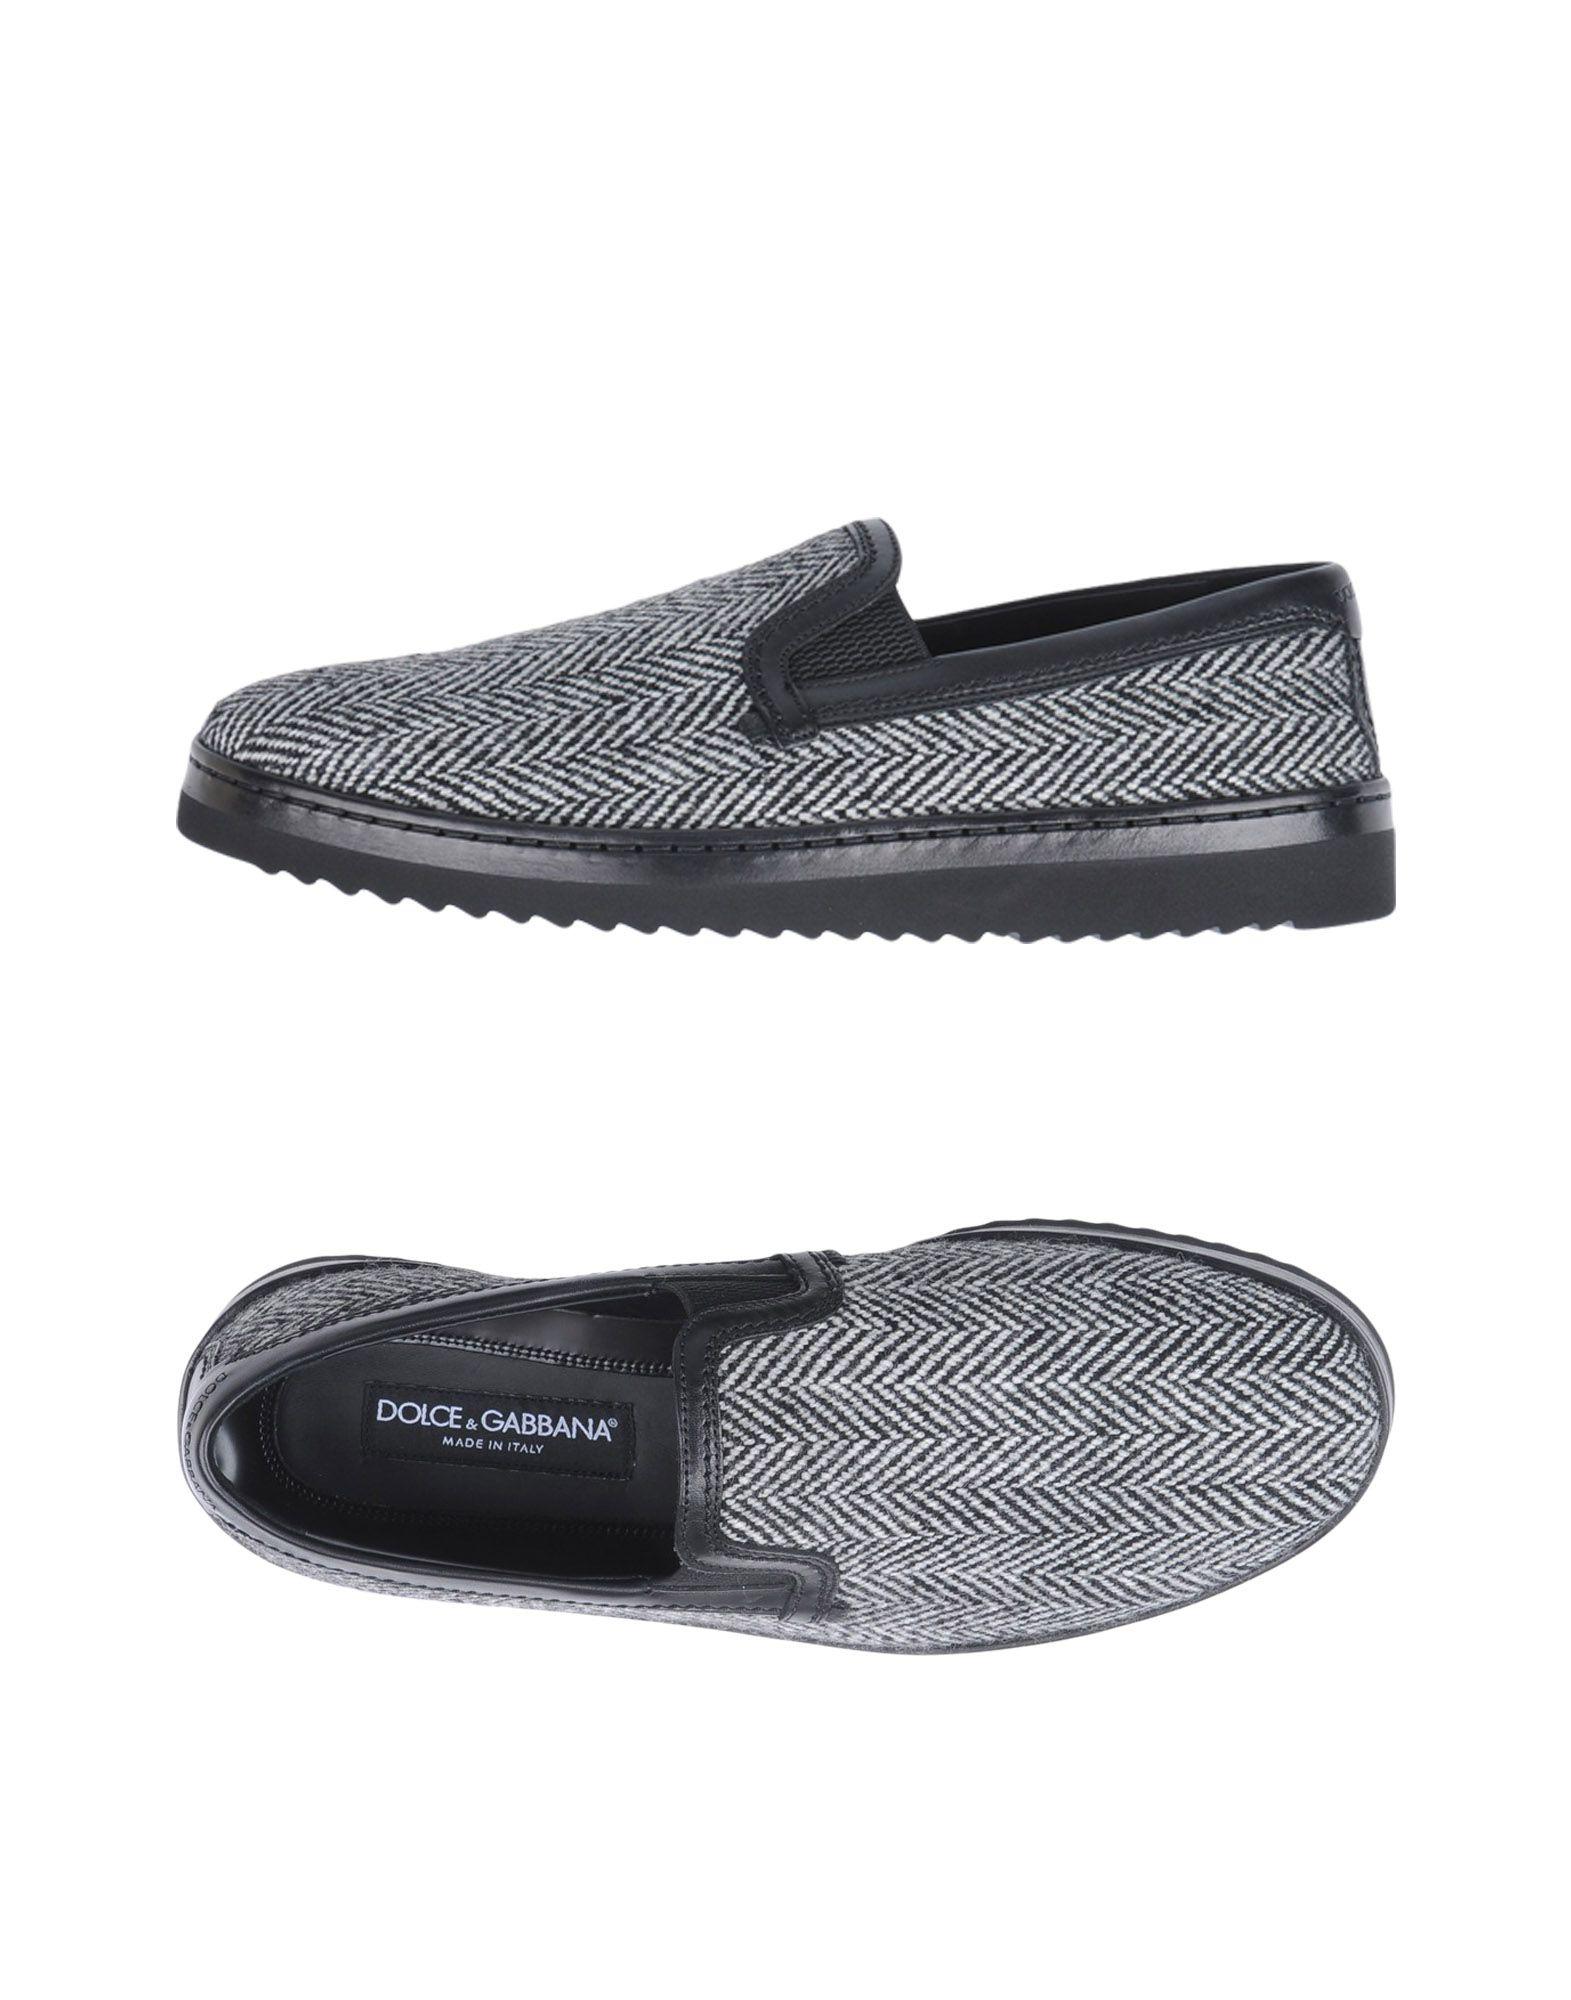 Dolce & Gabbana Sneakers Herren  Schuhe 11350537AI Gute Qualität beliebte Schuhe  933da9